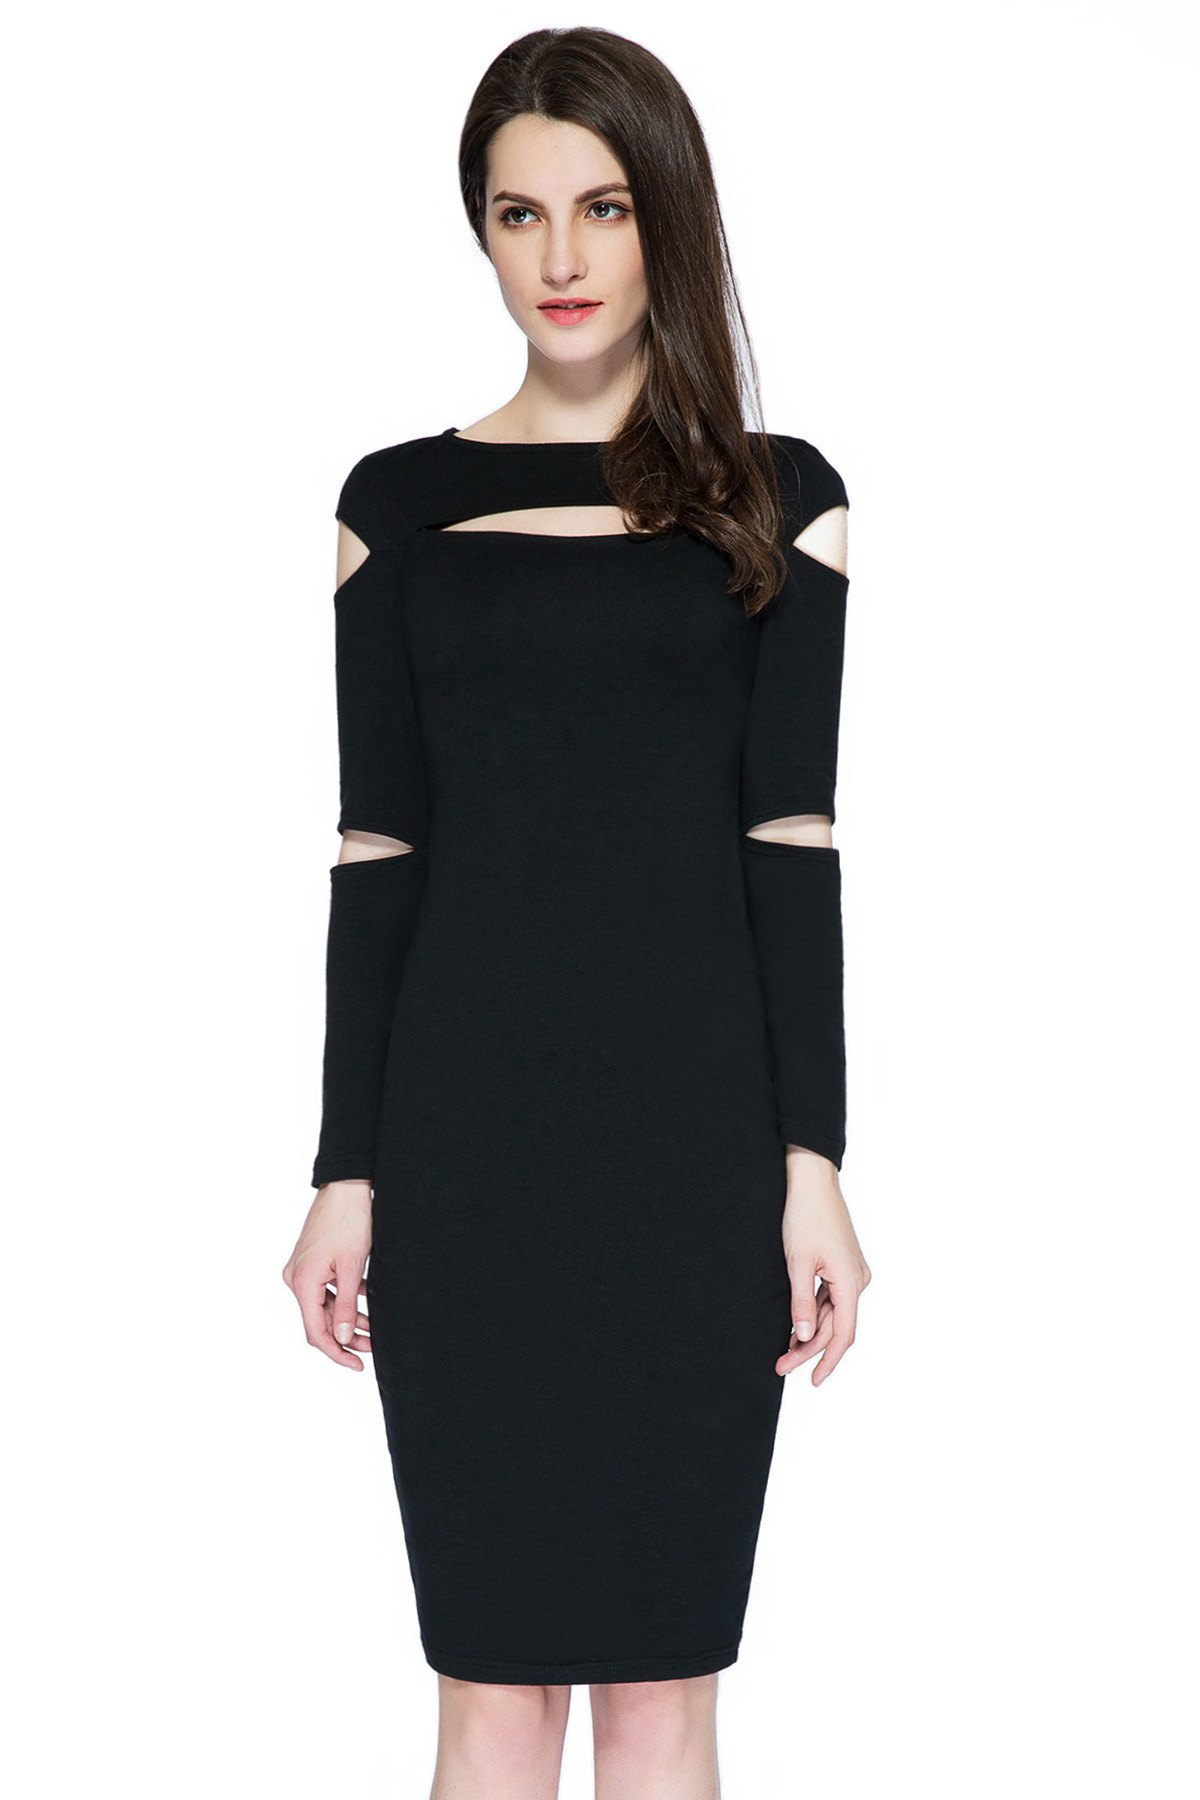 Black Cut Out Long Sleeve Dress